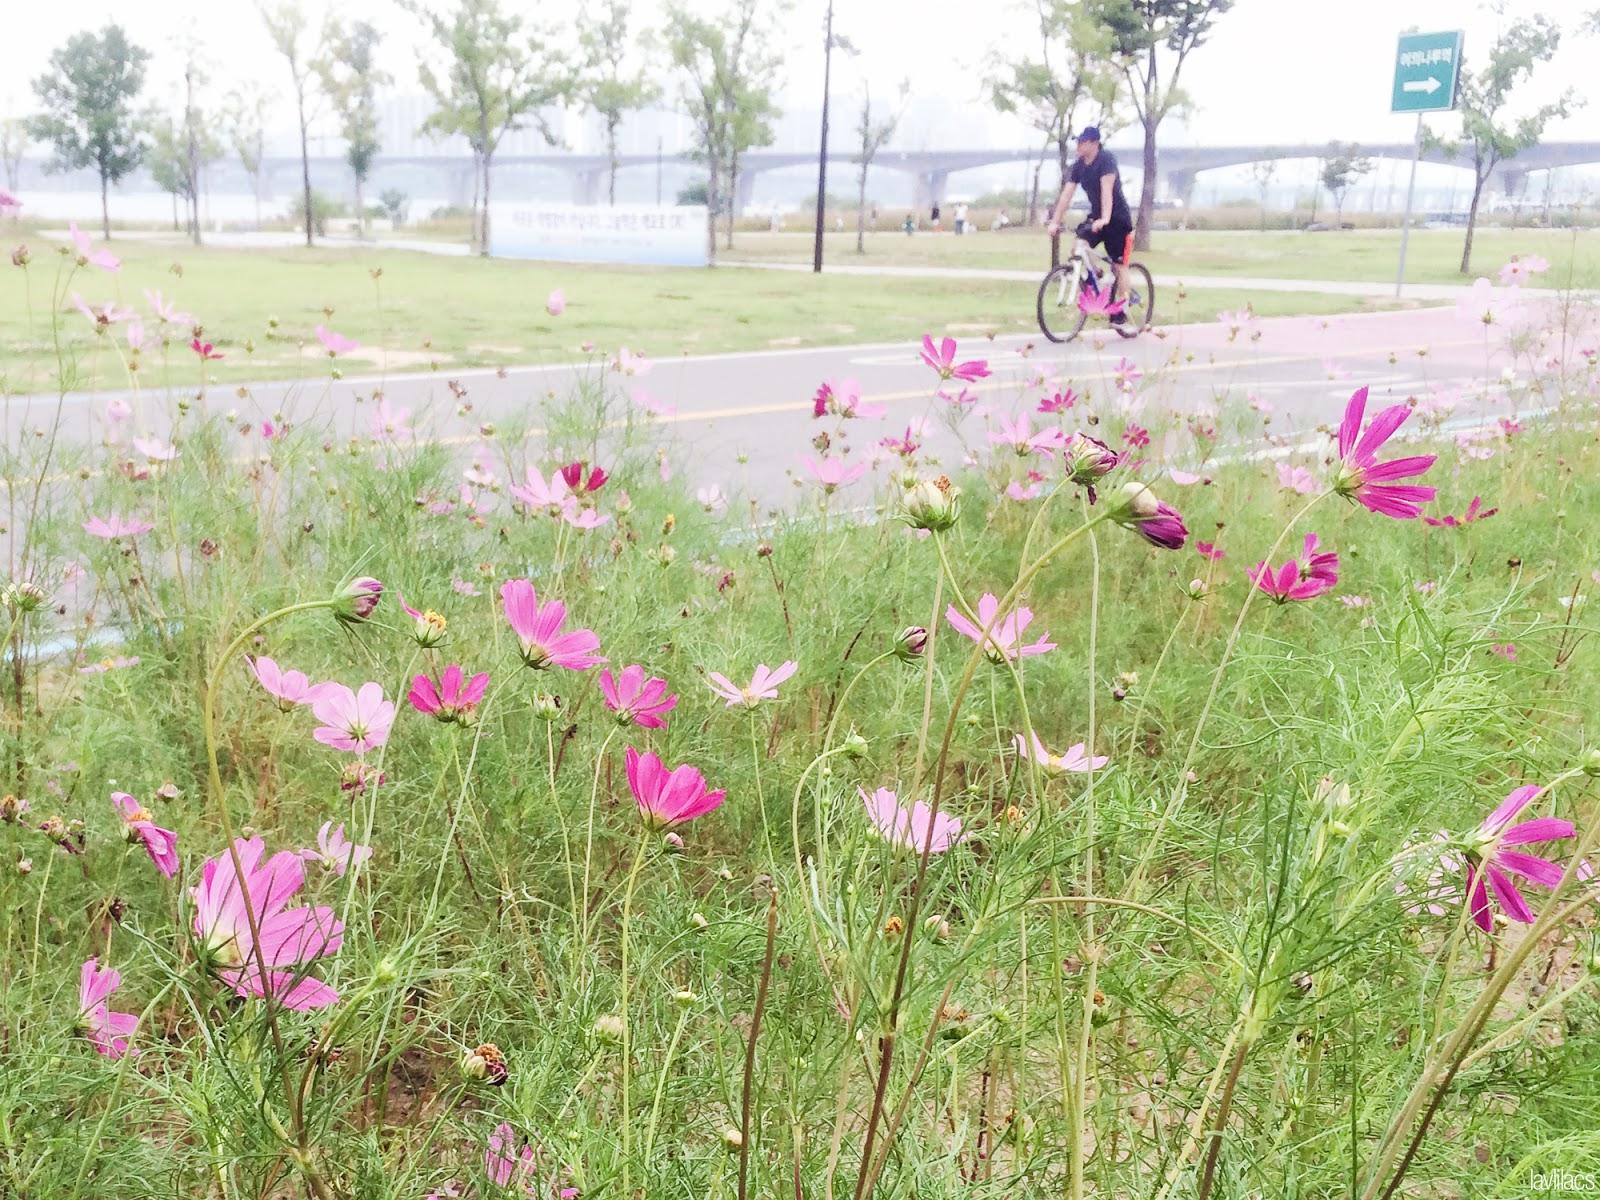 Seoul, Korea - Summer Study Abroad 2014 - Yeouido Park - Han River - guy biking cosmos flowers